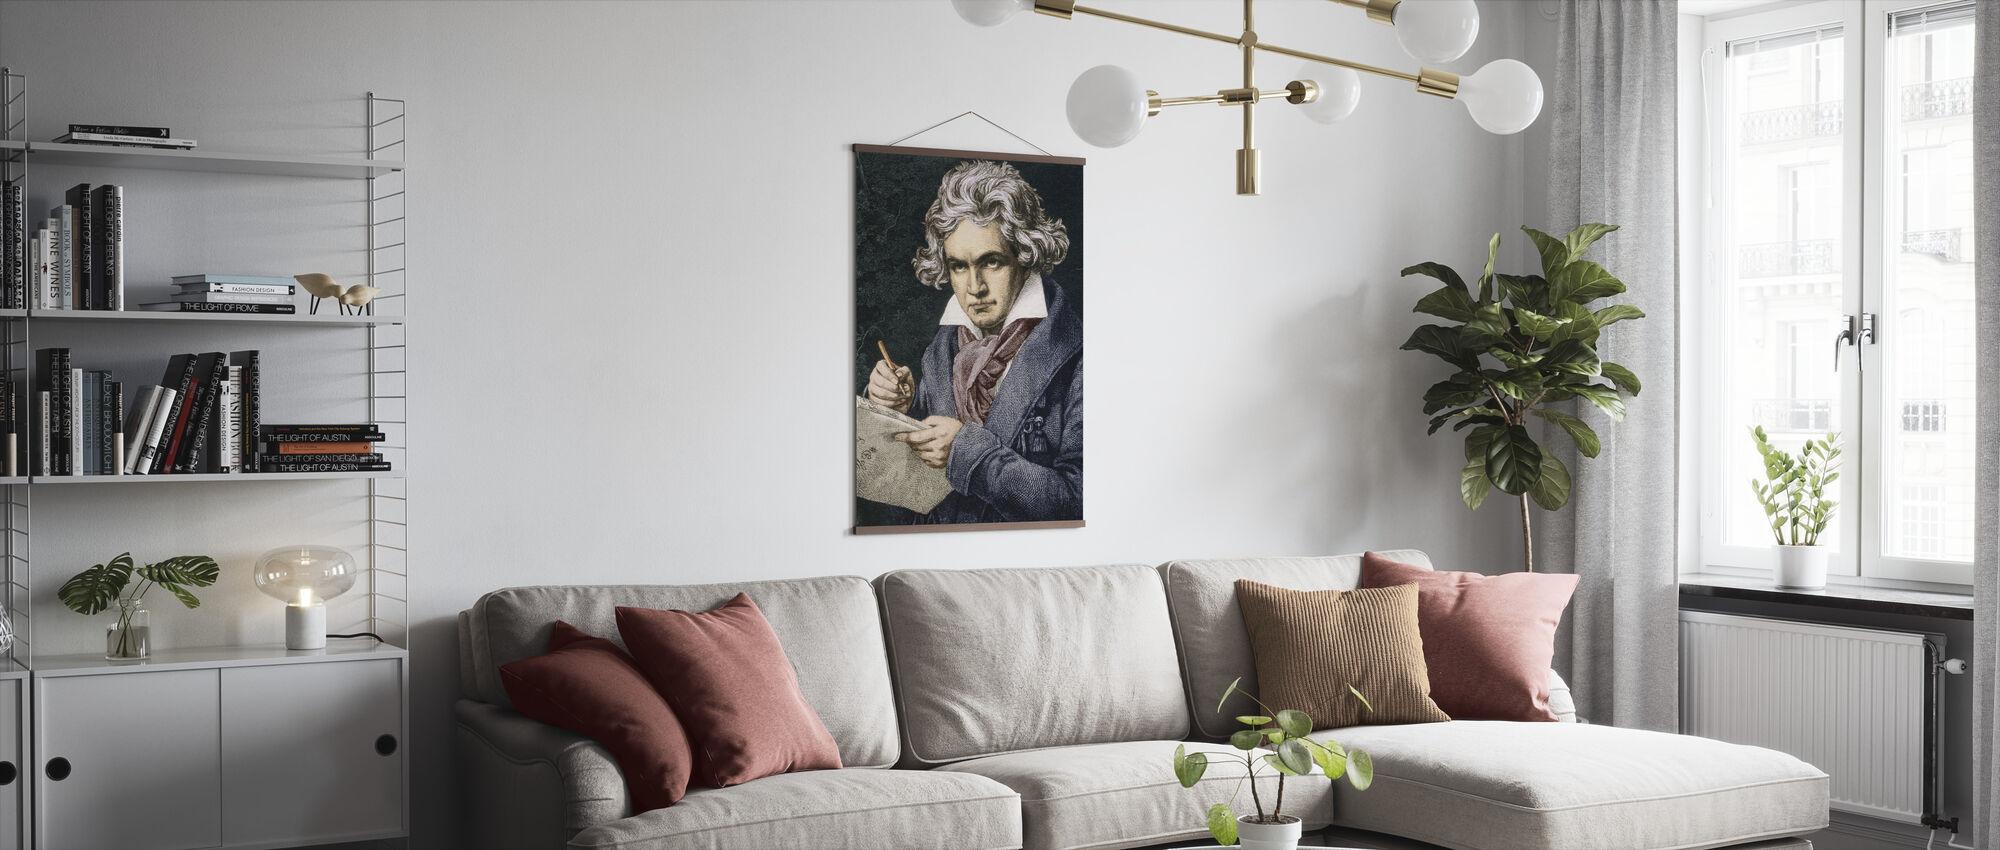 Composer Ludwig van Beethoven - Poster - Living Room